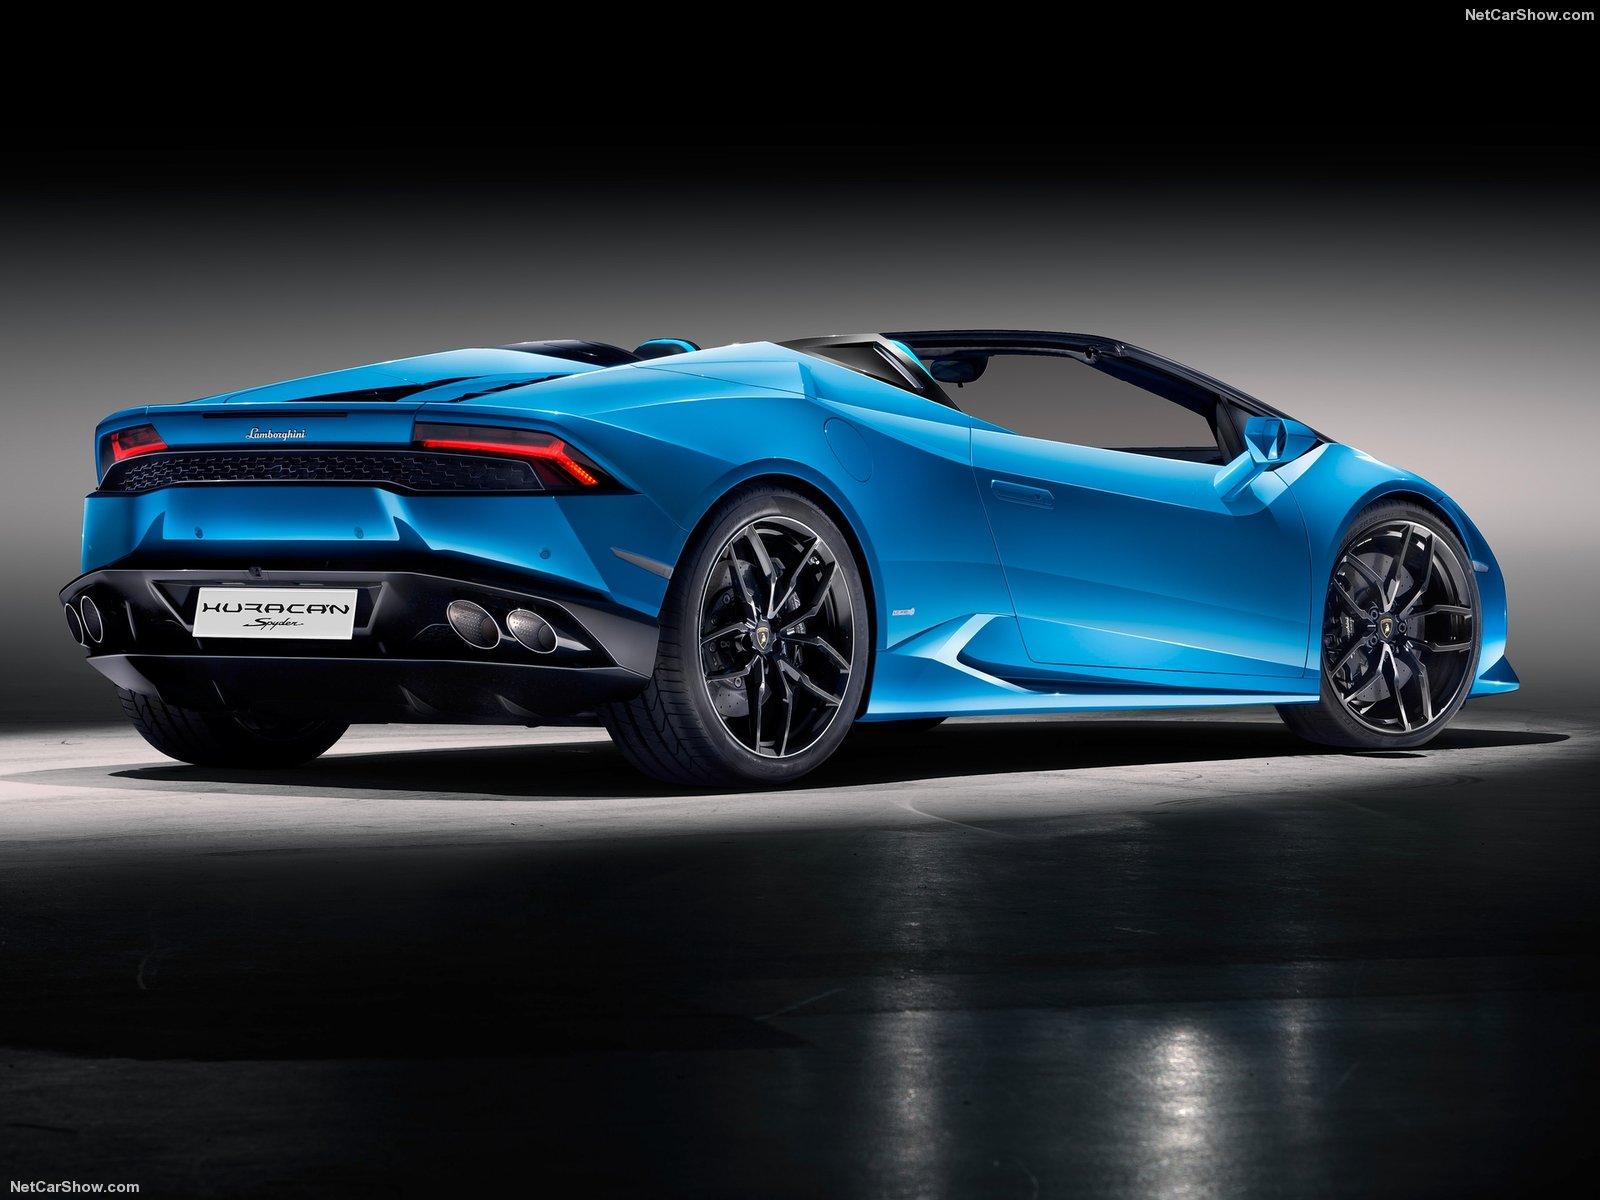 Lamborghini-Huracan_LP610-4_Spyder_2017_1600x1200_wallpaper_04.jpg